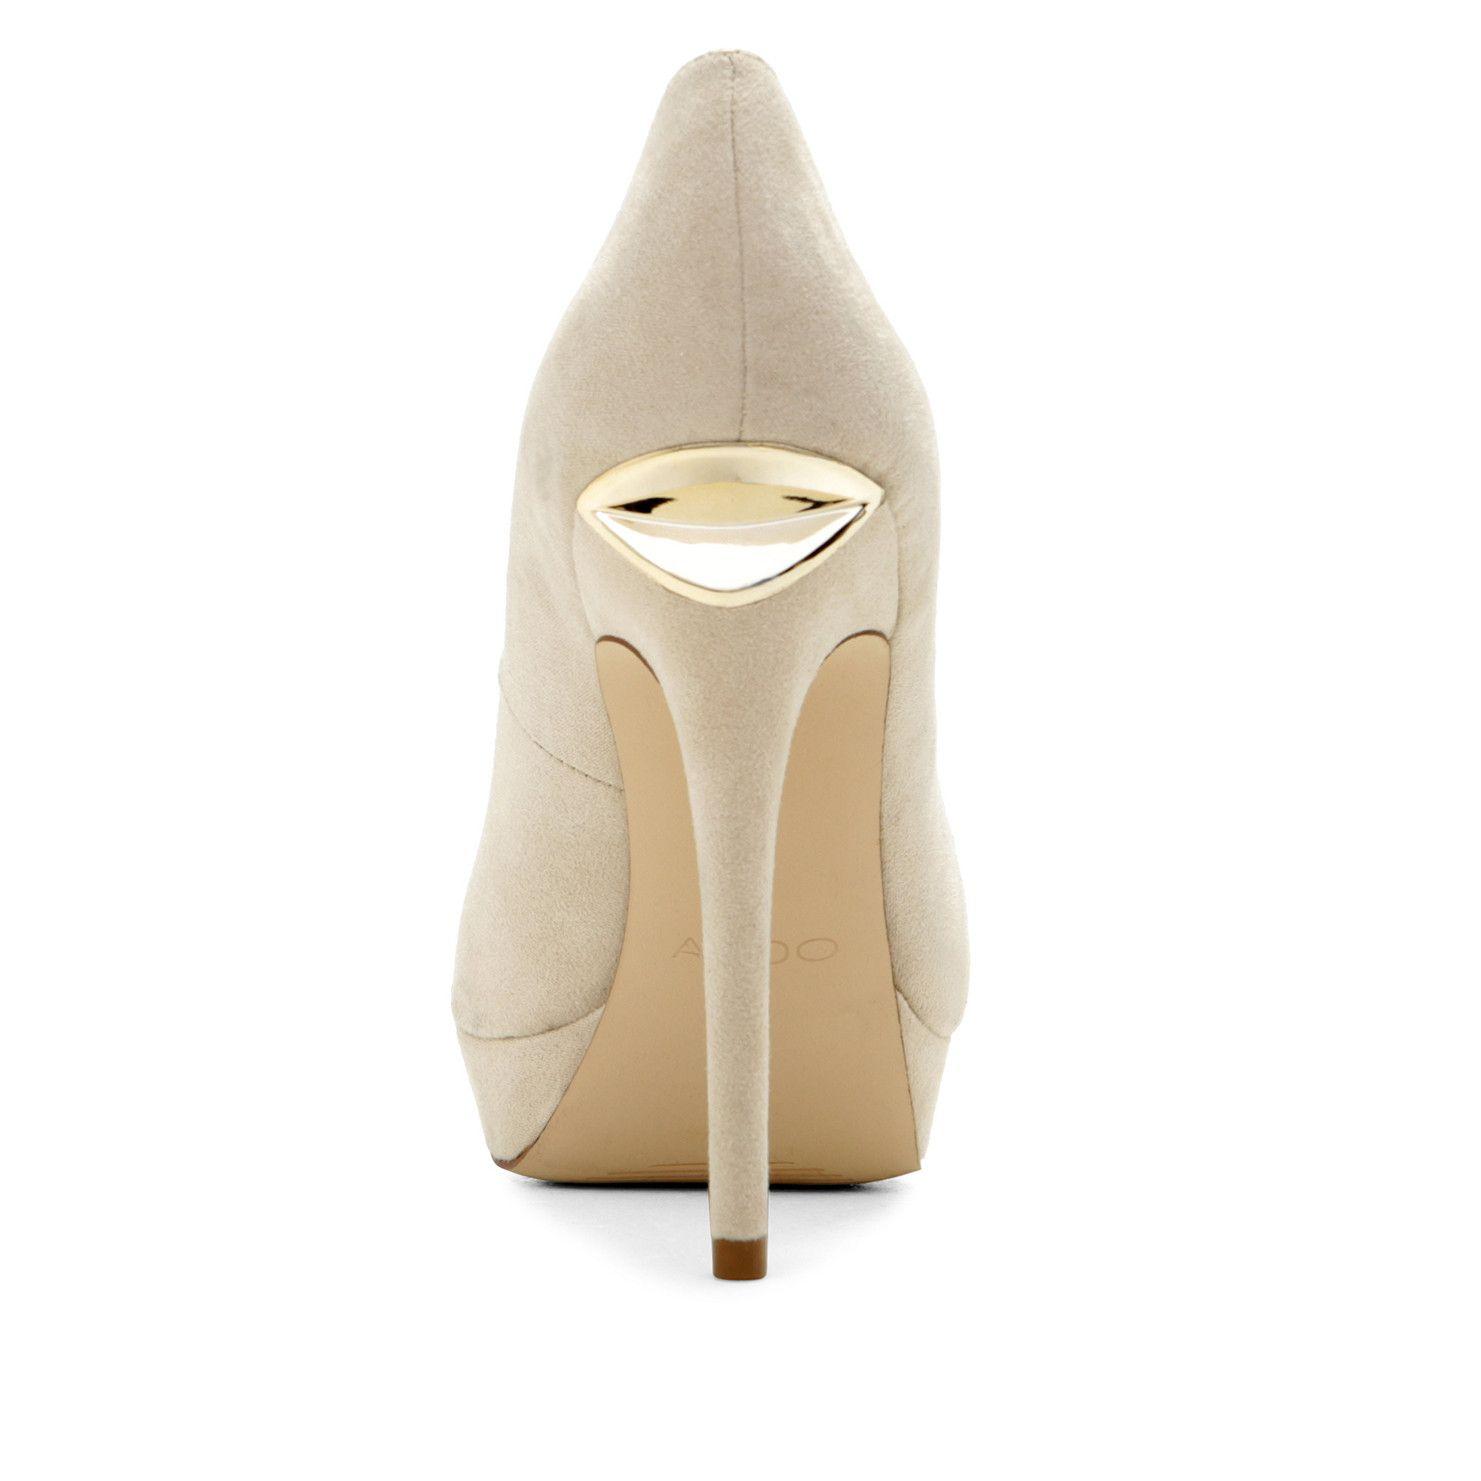 Aldo AOISA pumps bone suede 2015 03 Shoes High HeelsAldoWoman